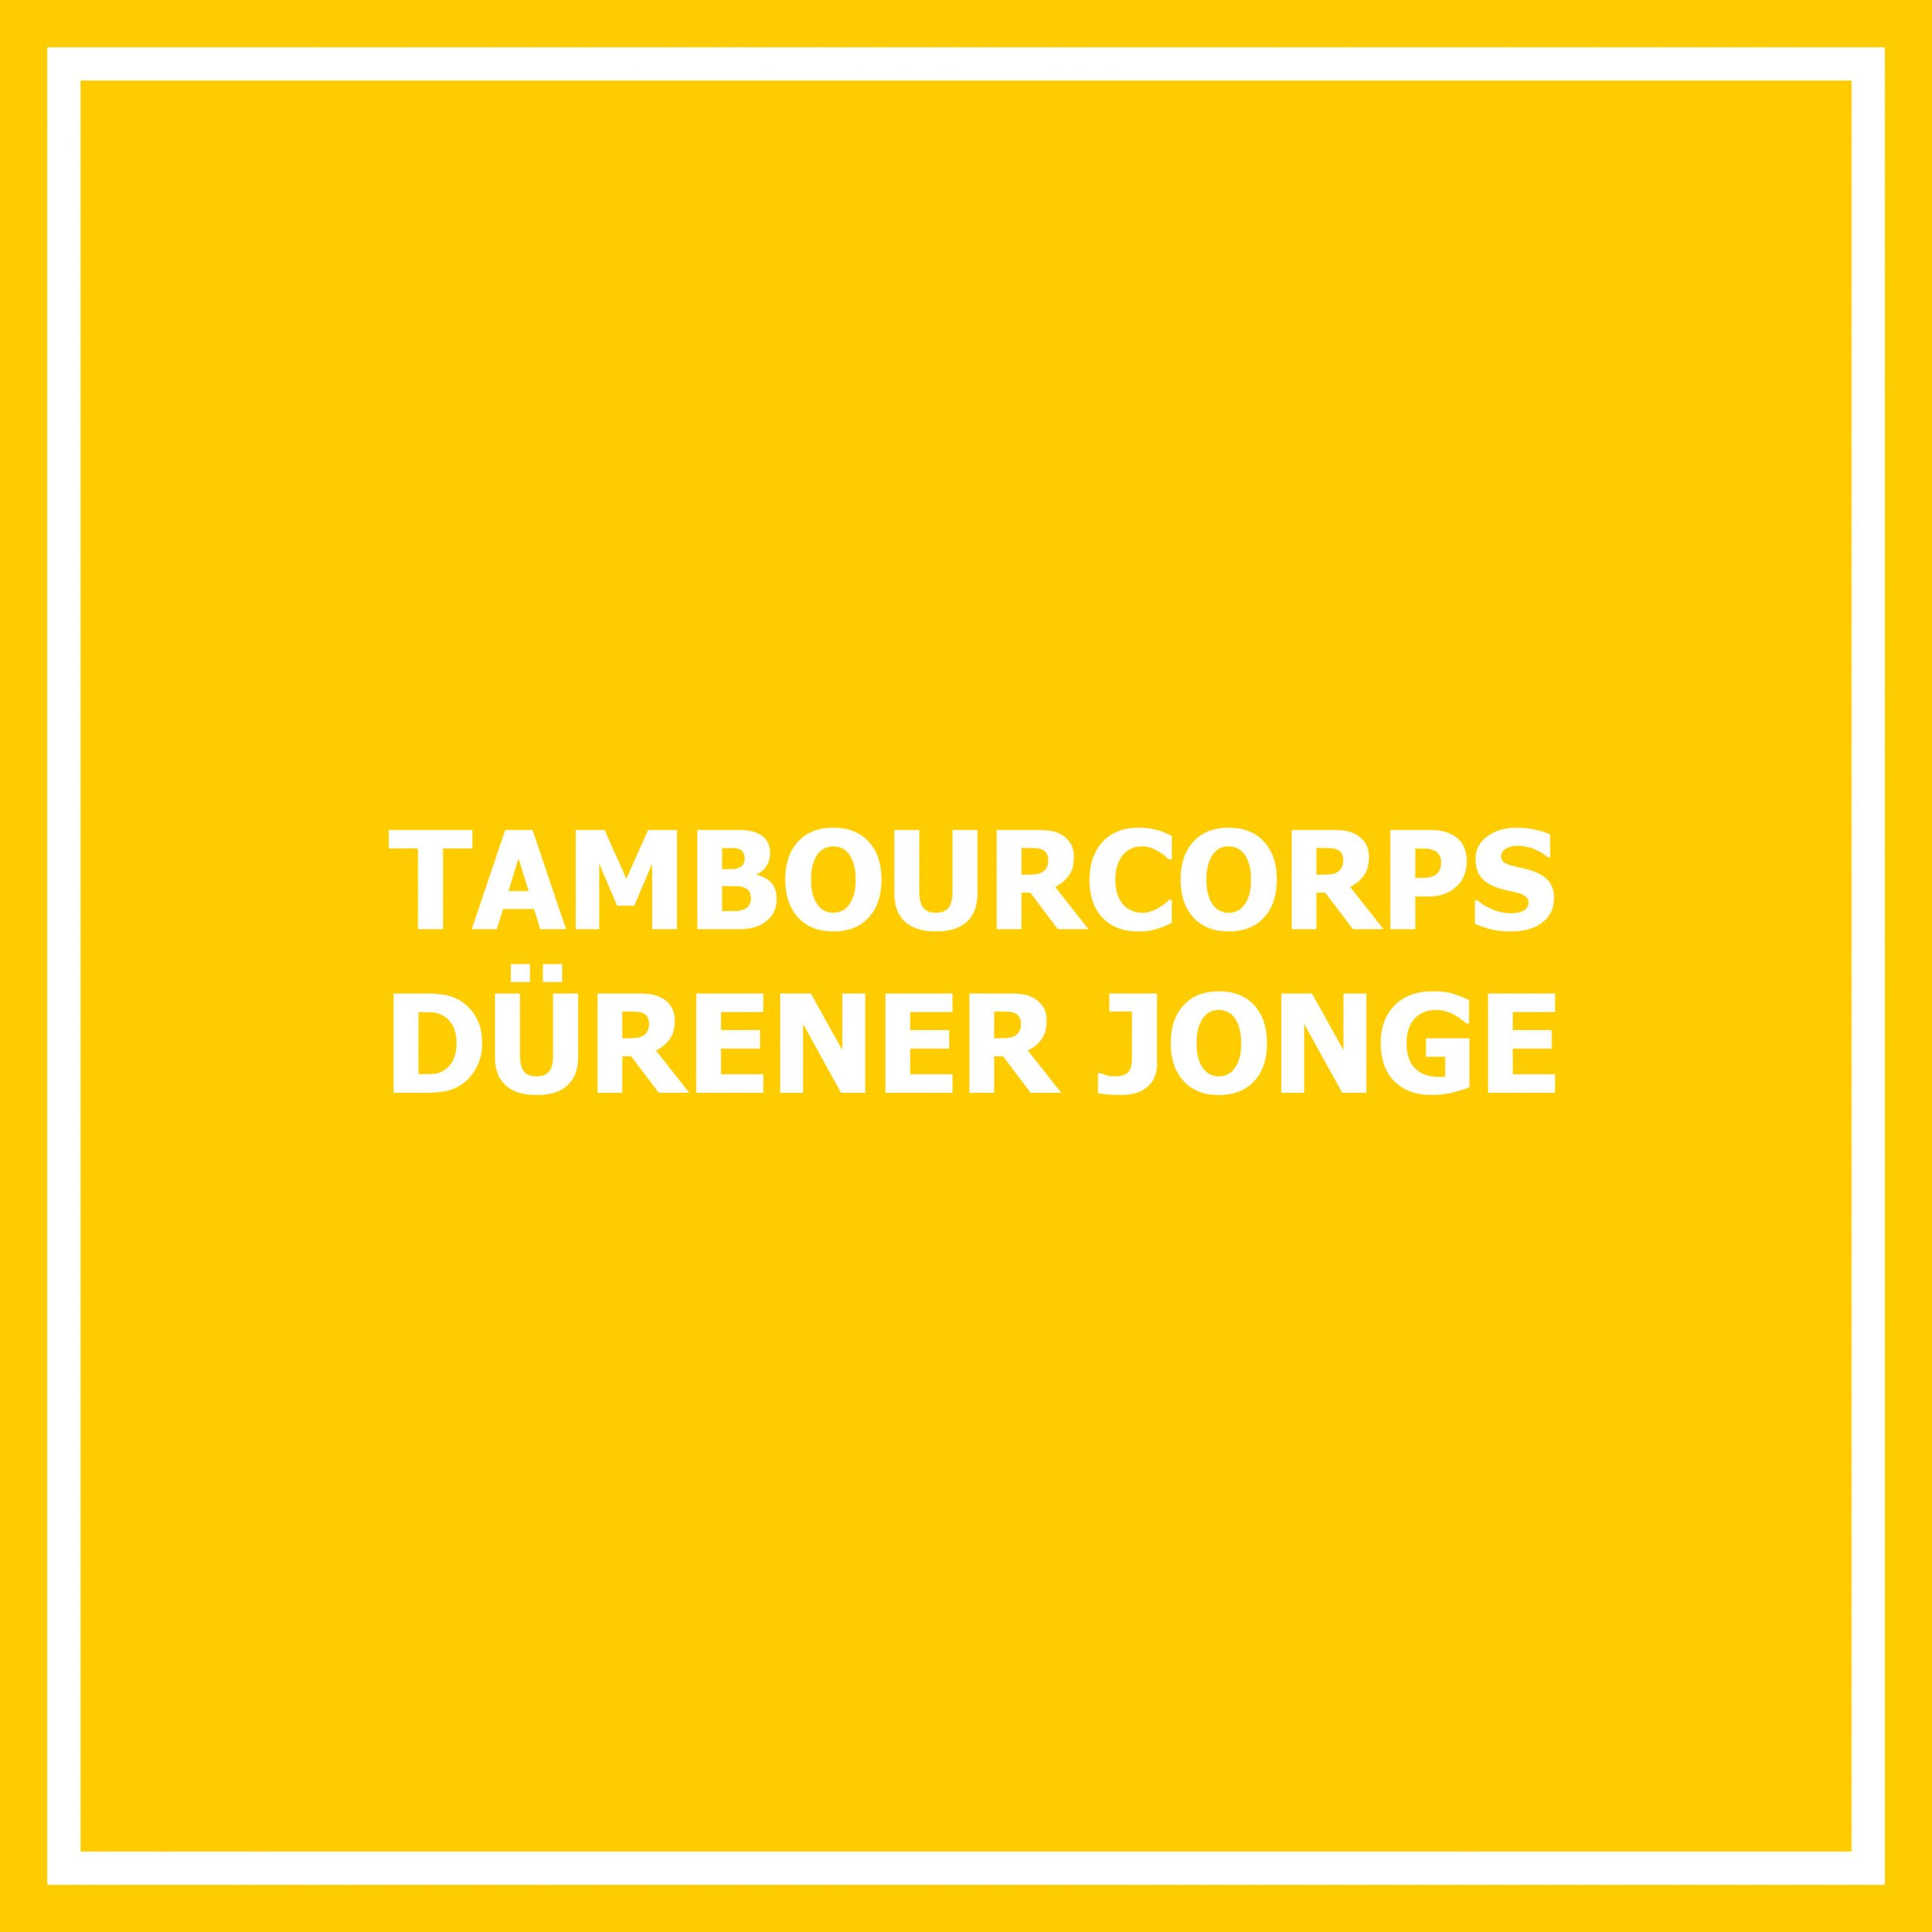 Tambourcorps Dürener Jonge